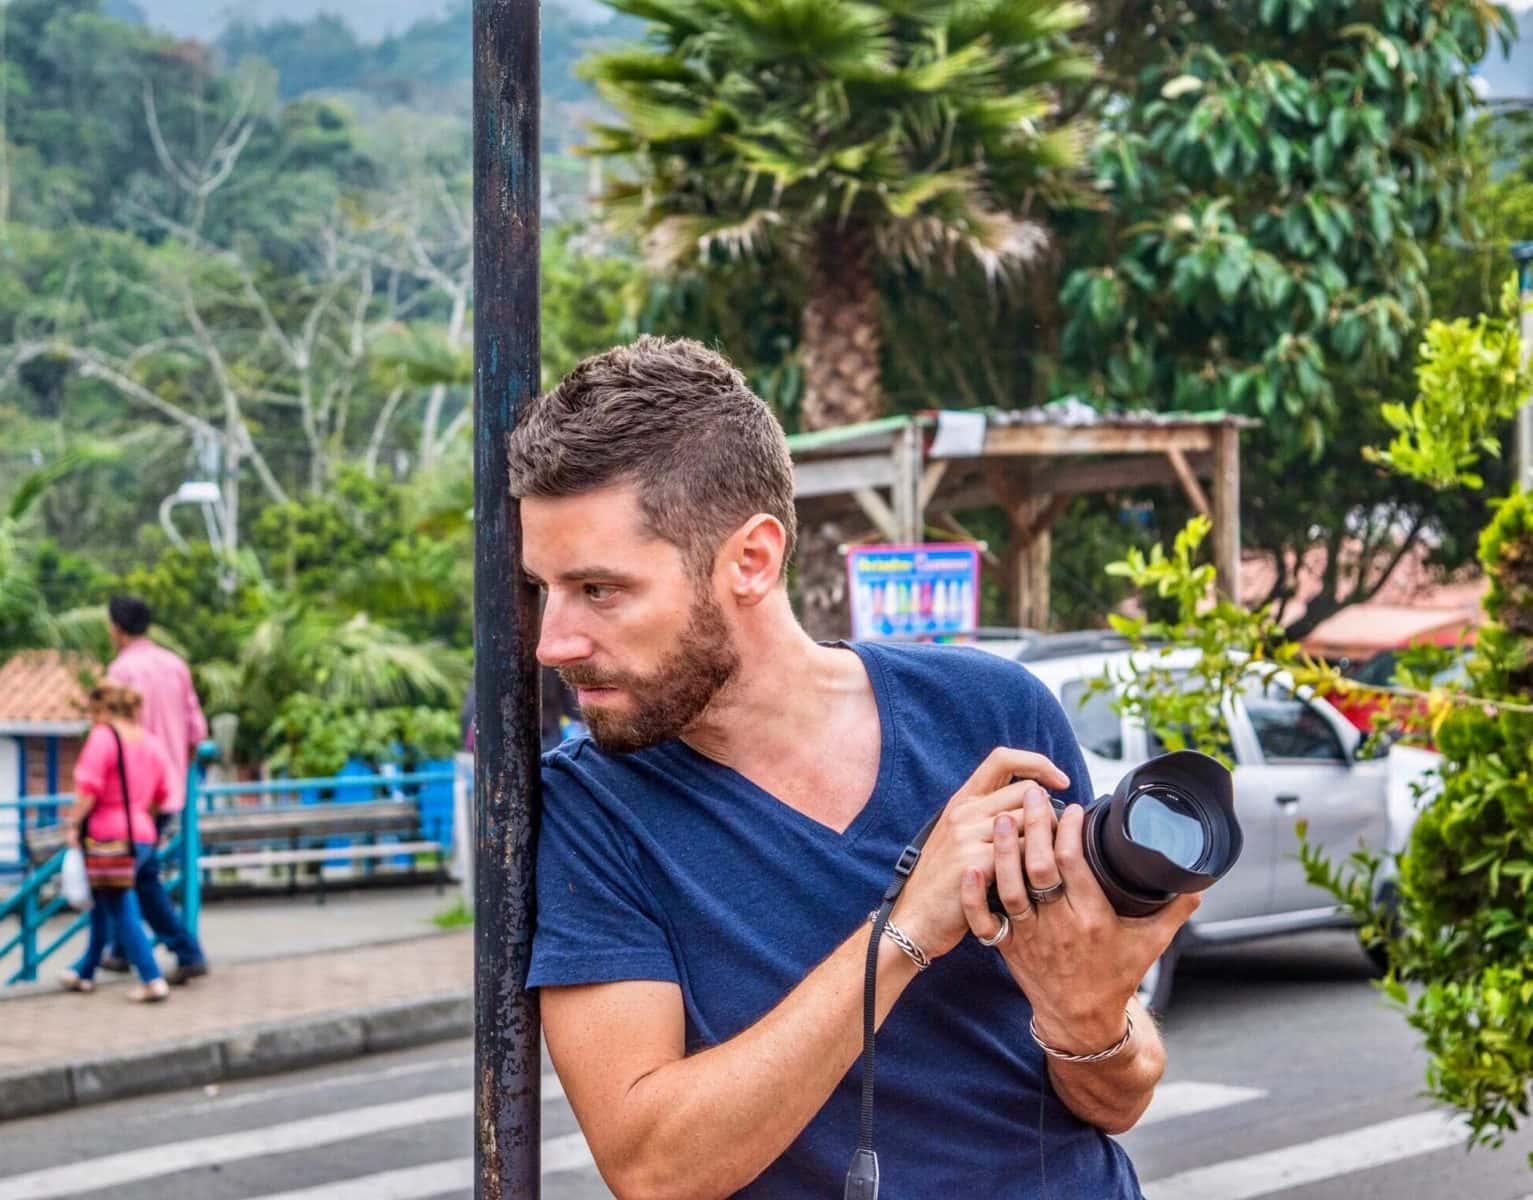 Shooting Photos near Santa Elena, Colombia